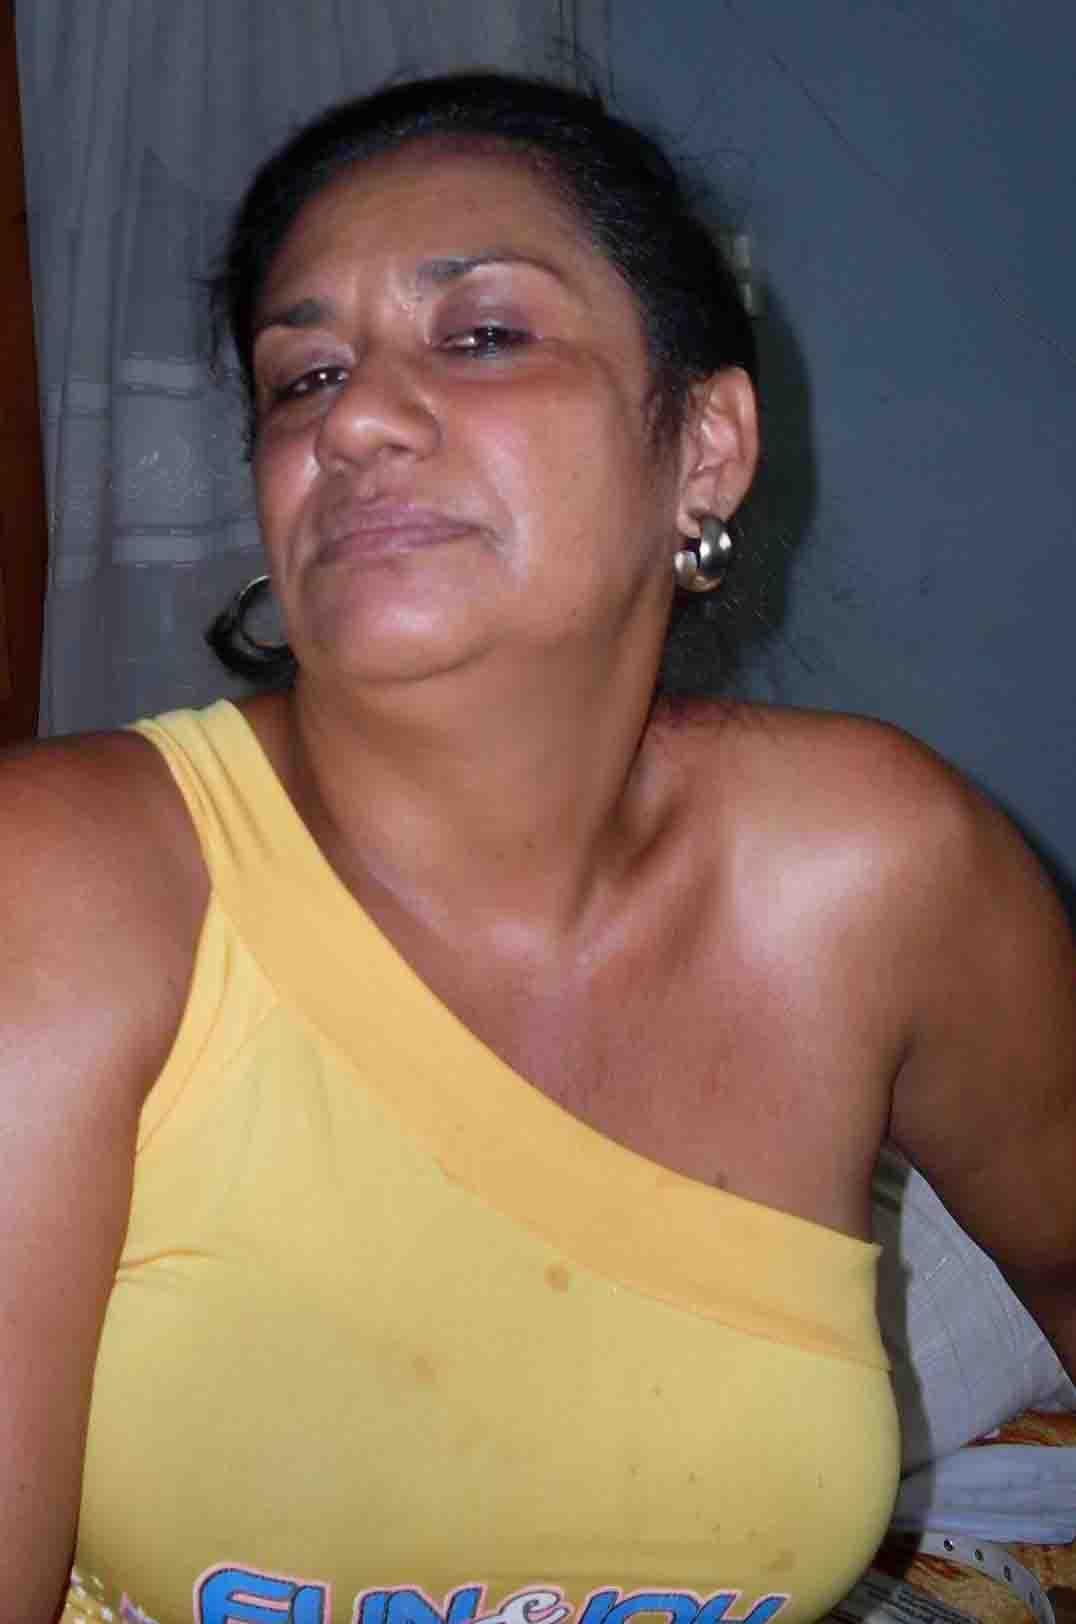 Adailza, Mujer de Guantanamo buscando pareja